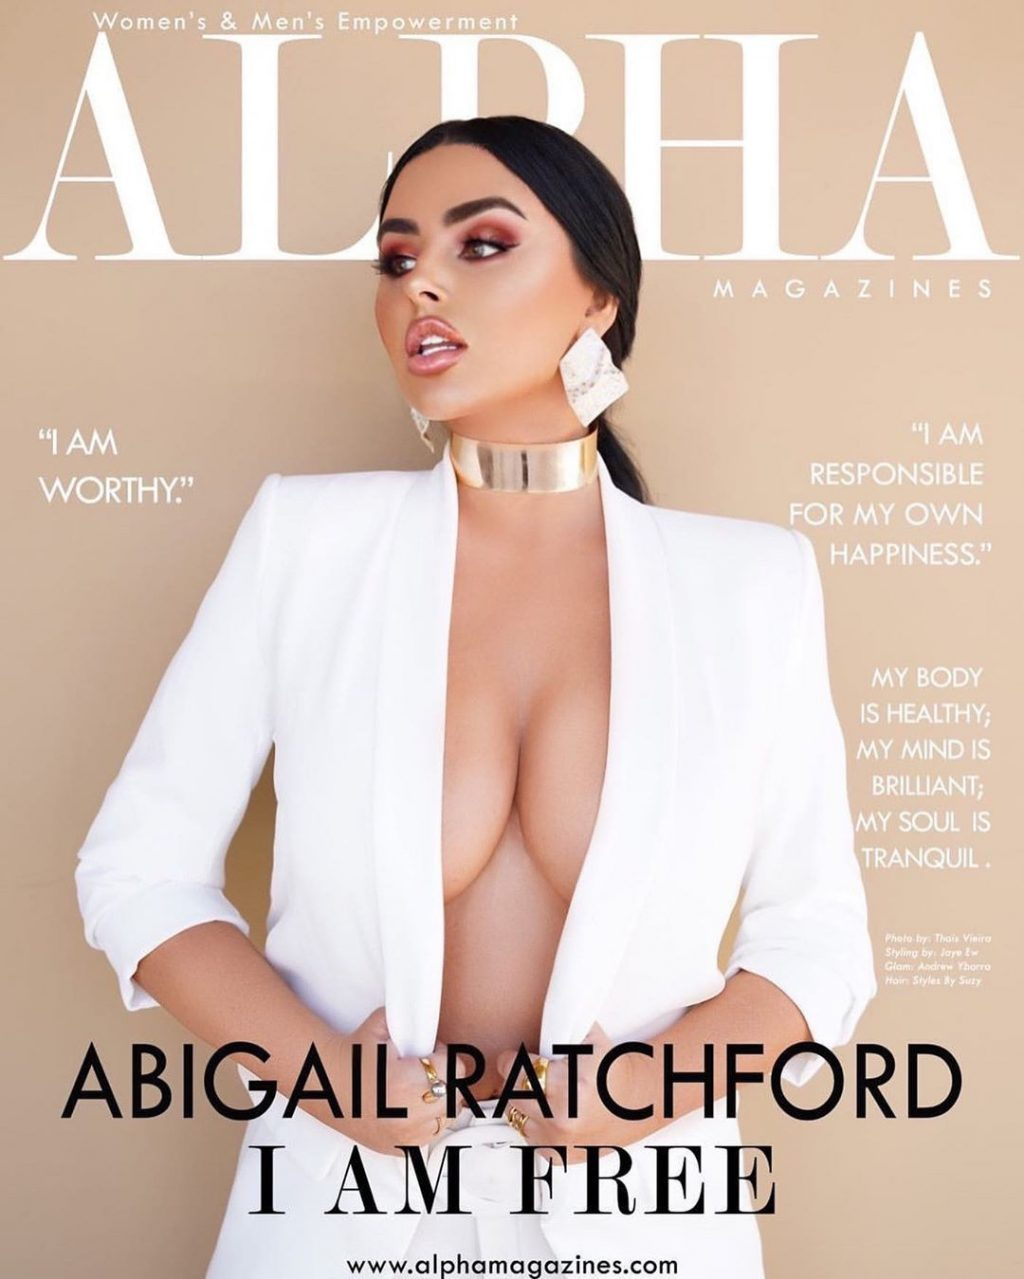 abigail-ratchford